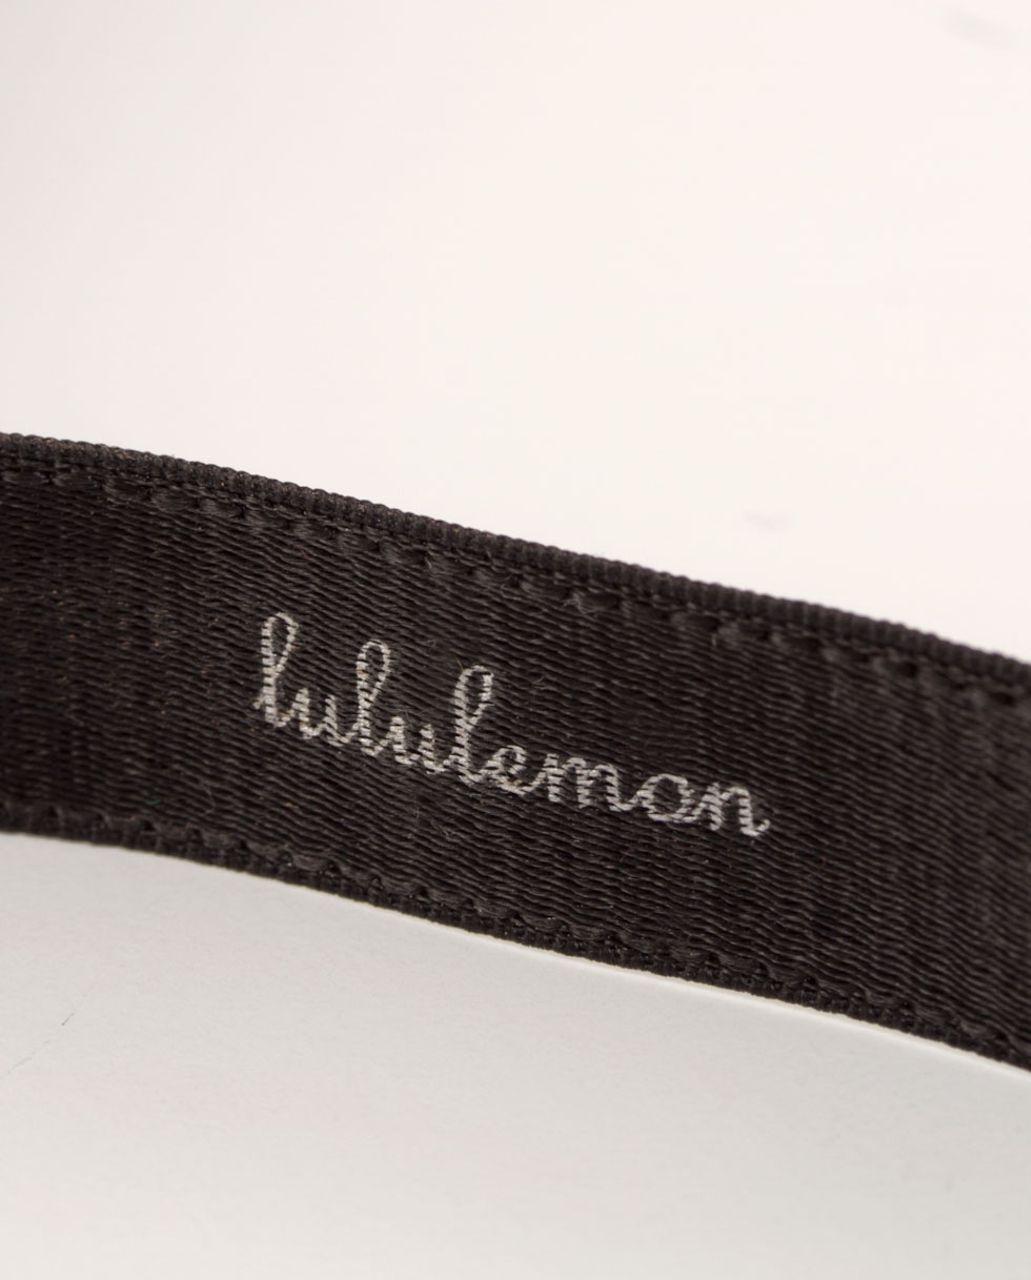 Lululemon Skinny Satin Pirouette - Black (First Release)